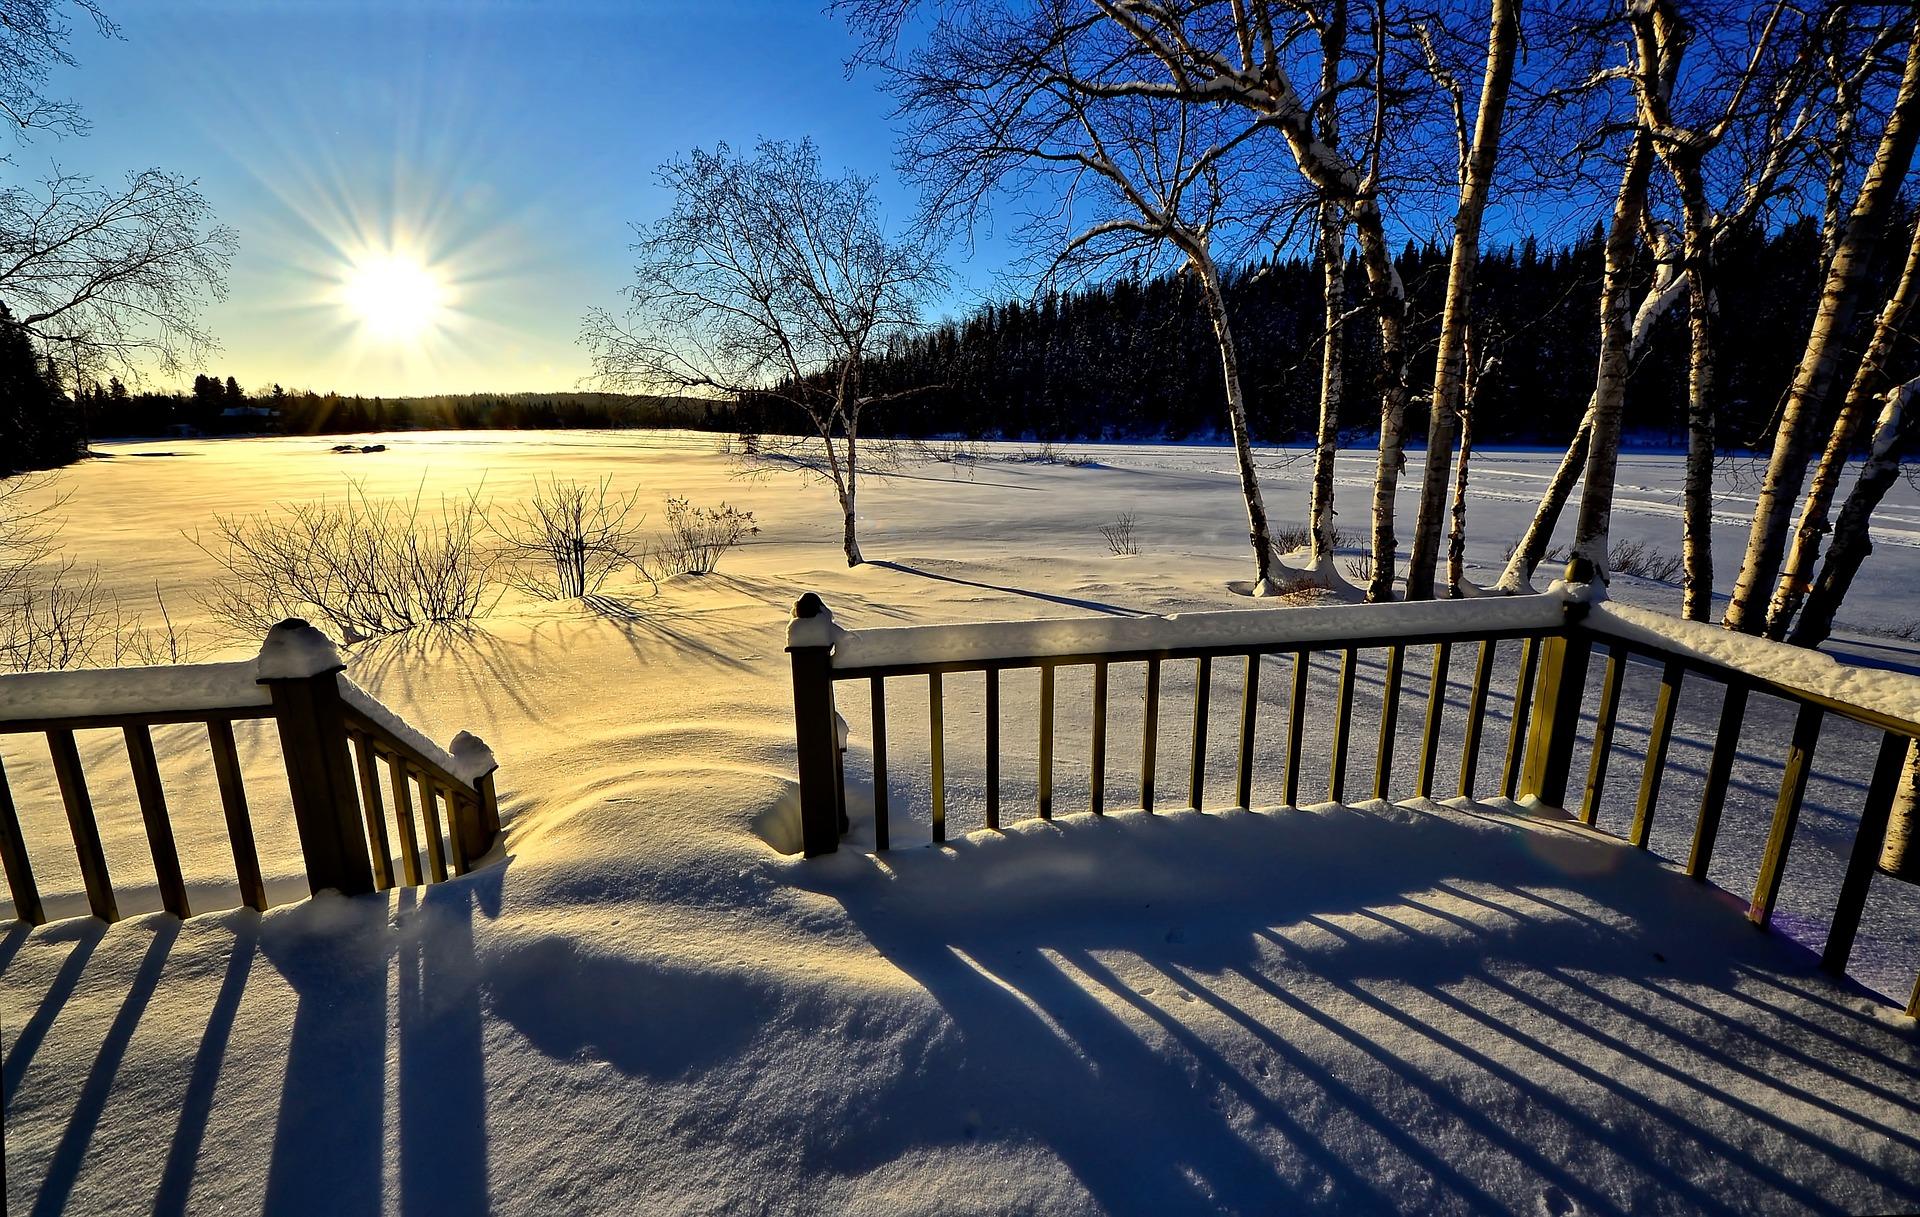 A Canadian Winter Landscape